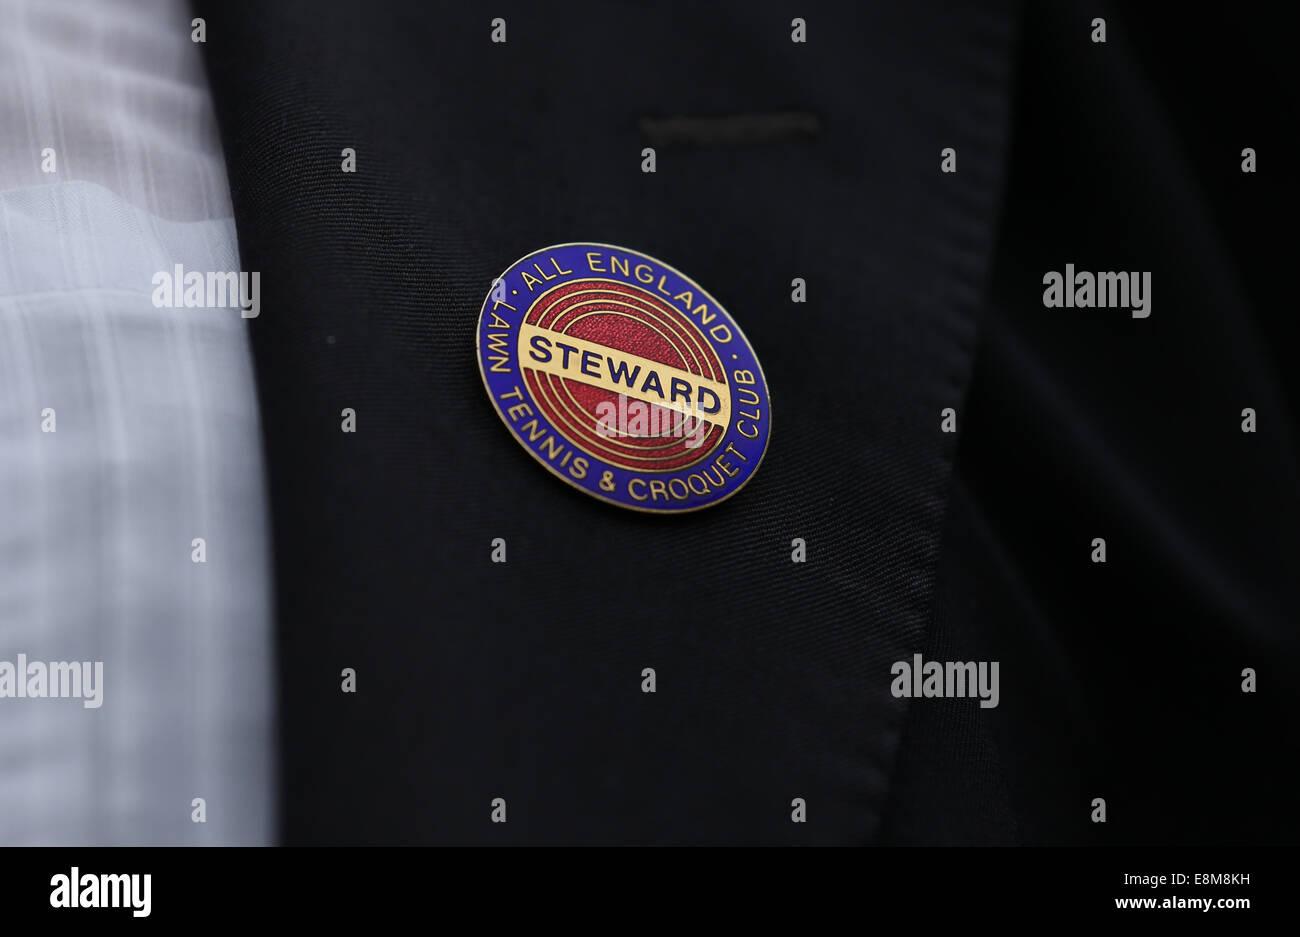 Close up of a Stewart badge at the Wimbledon Championships 2014, London,England. - Stock Image